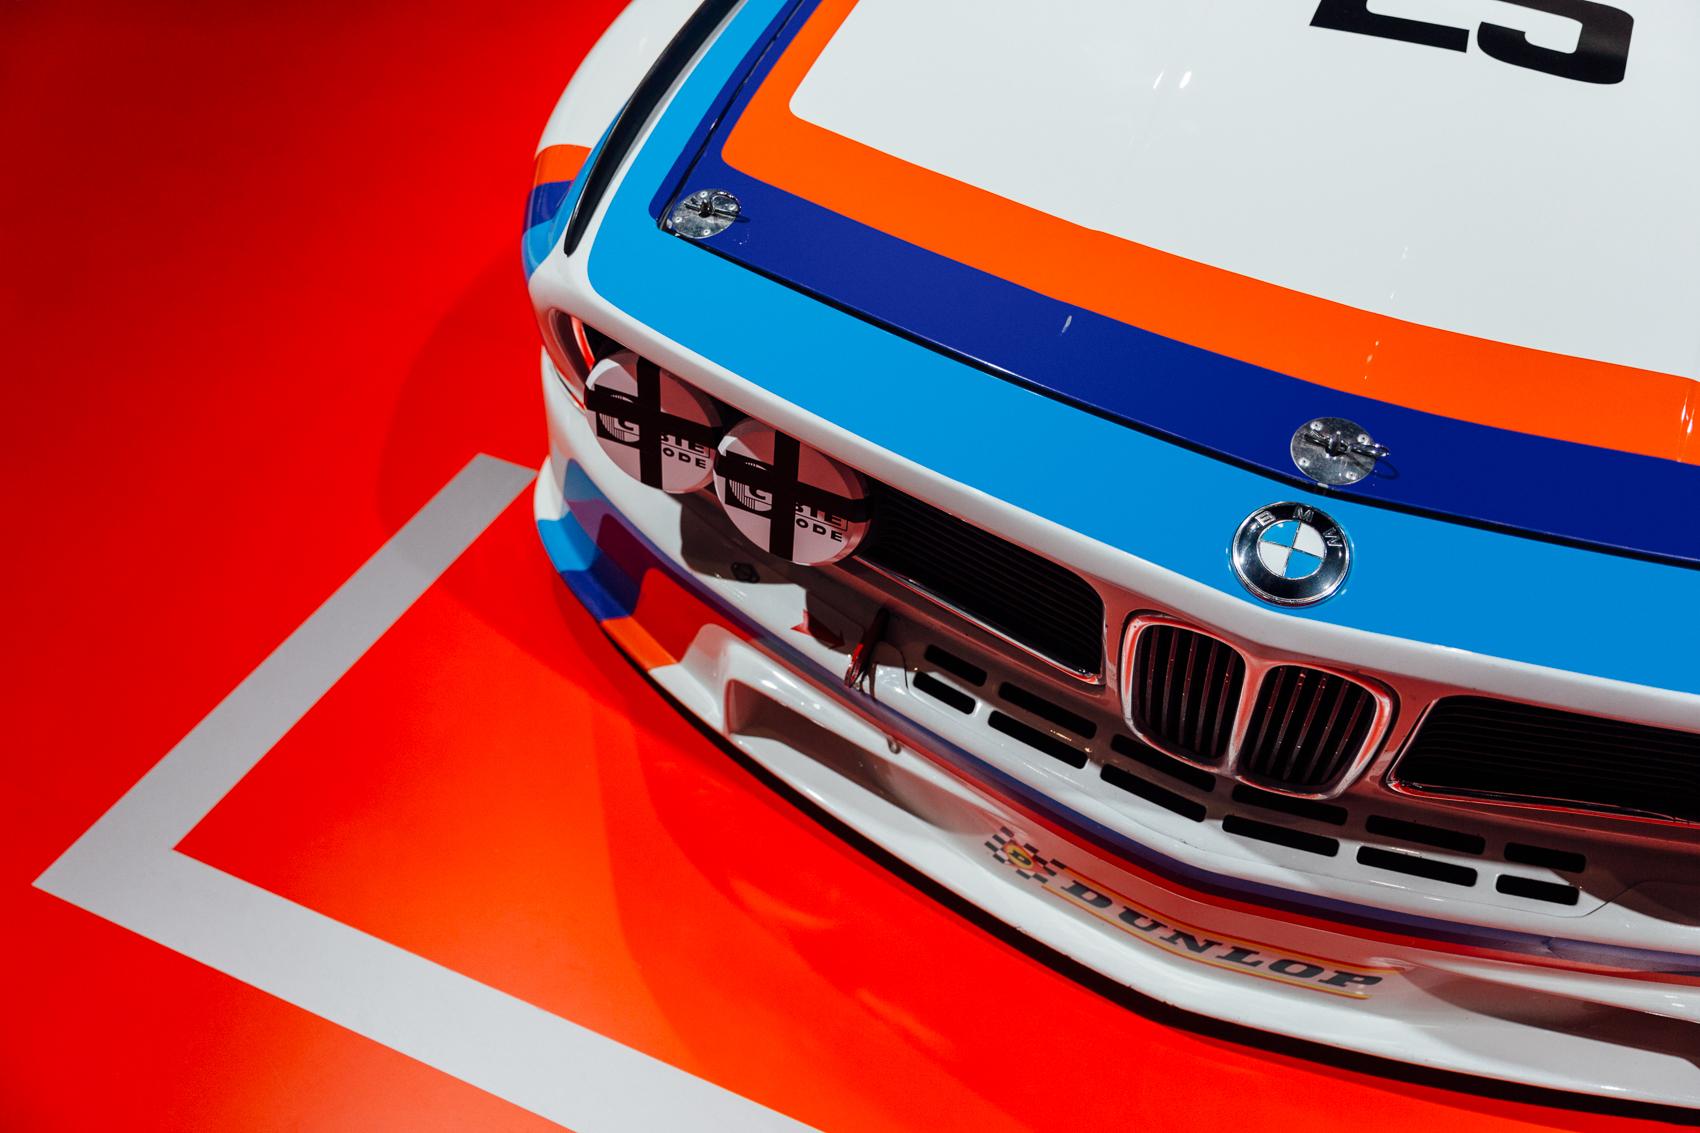 A31U7570_edit-BMW 3.0 CSL-batmobile.jpg